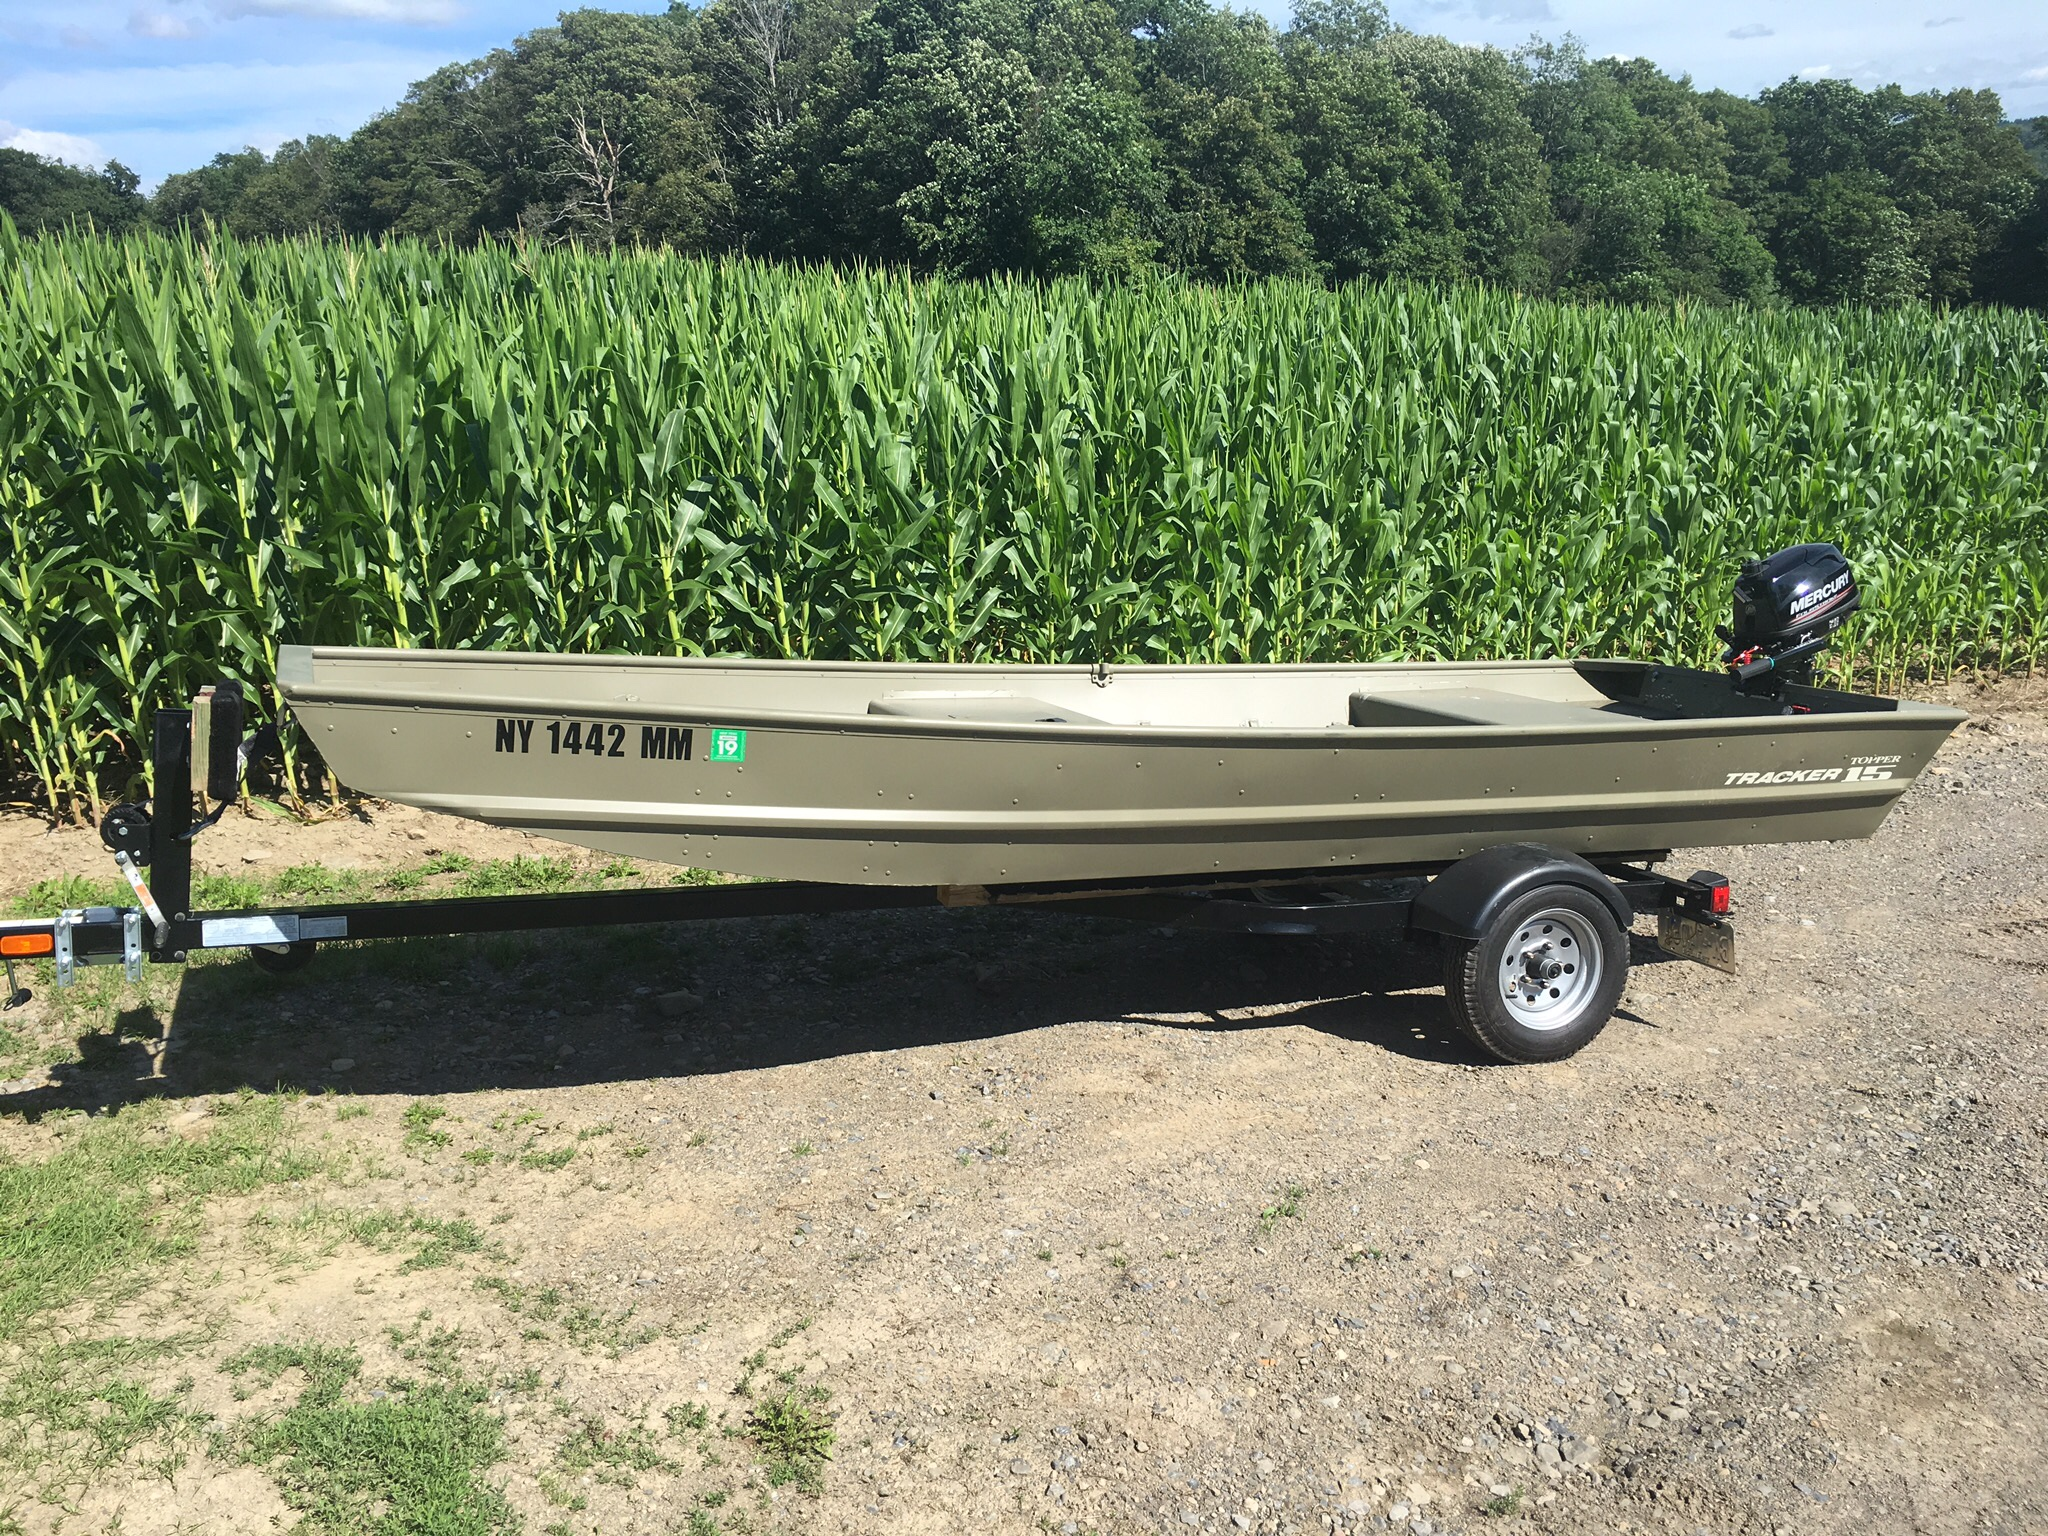 Brand new 1552 tracker Jon boat, trailer and 5 hp Mercury 4